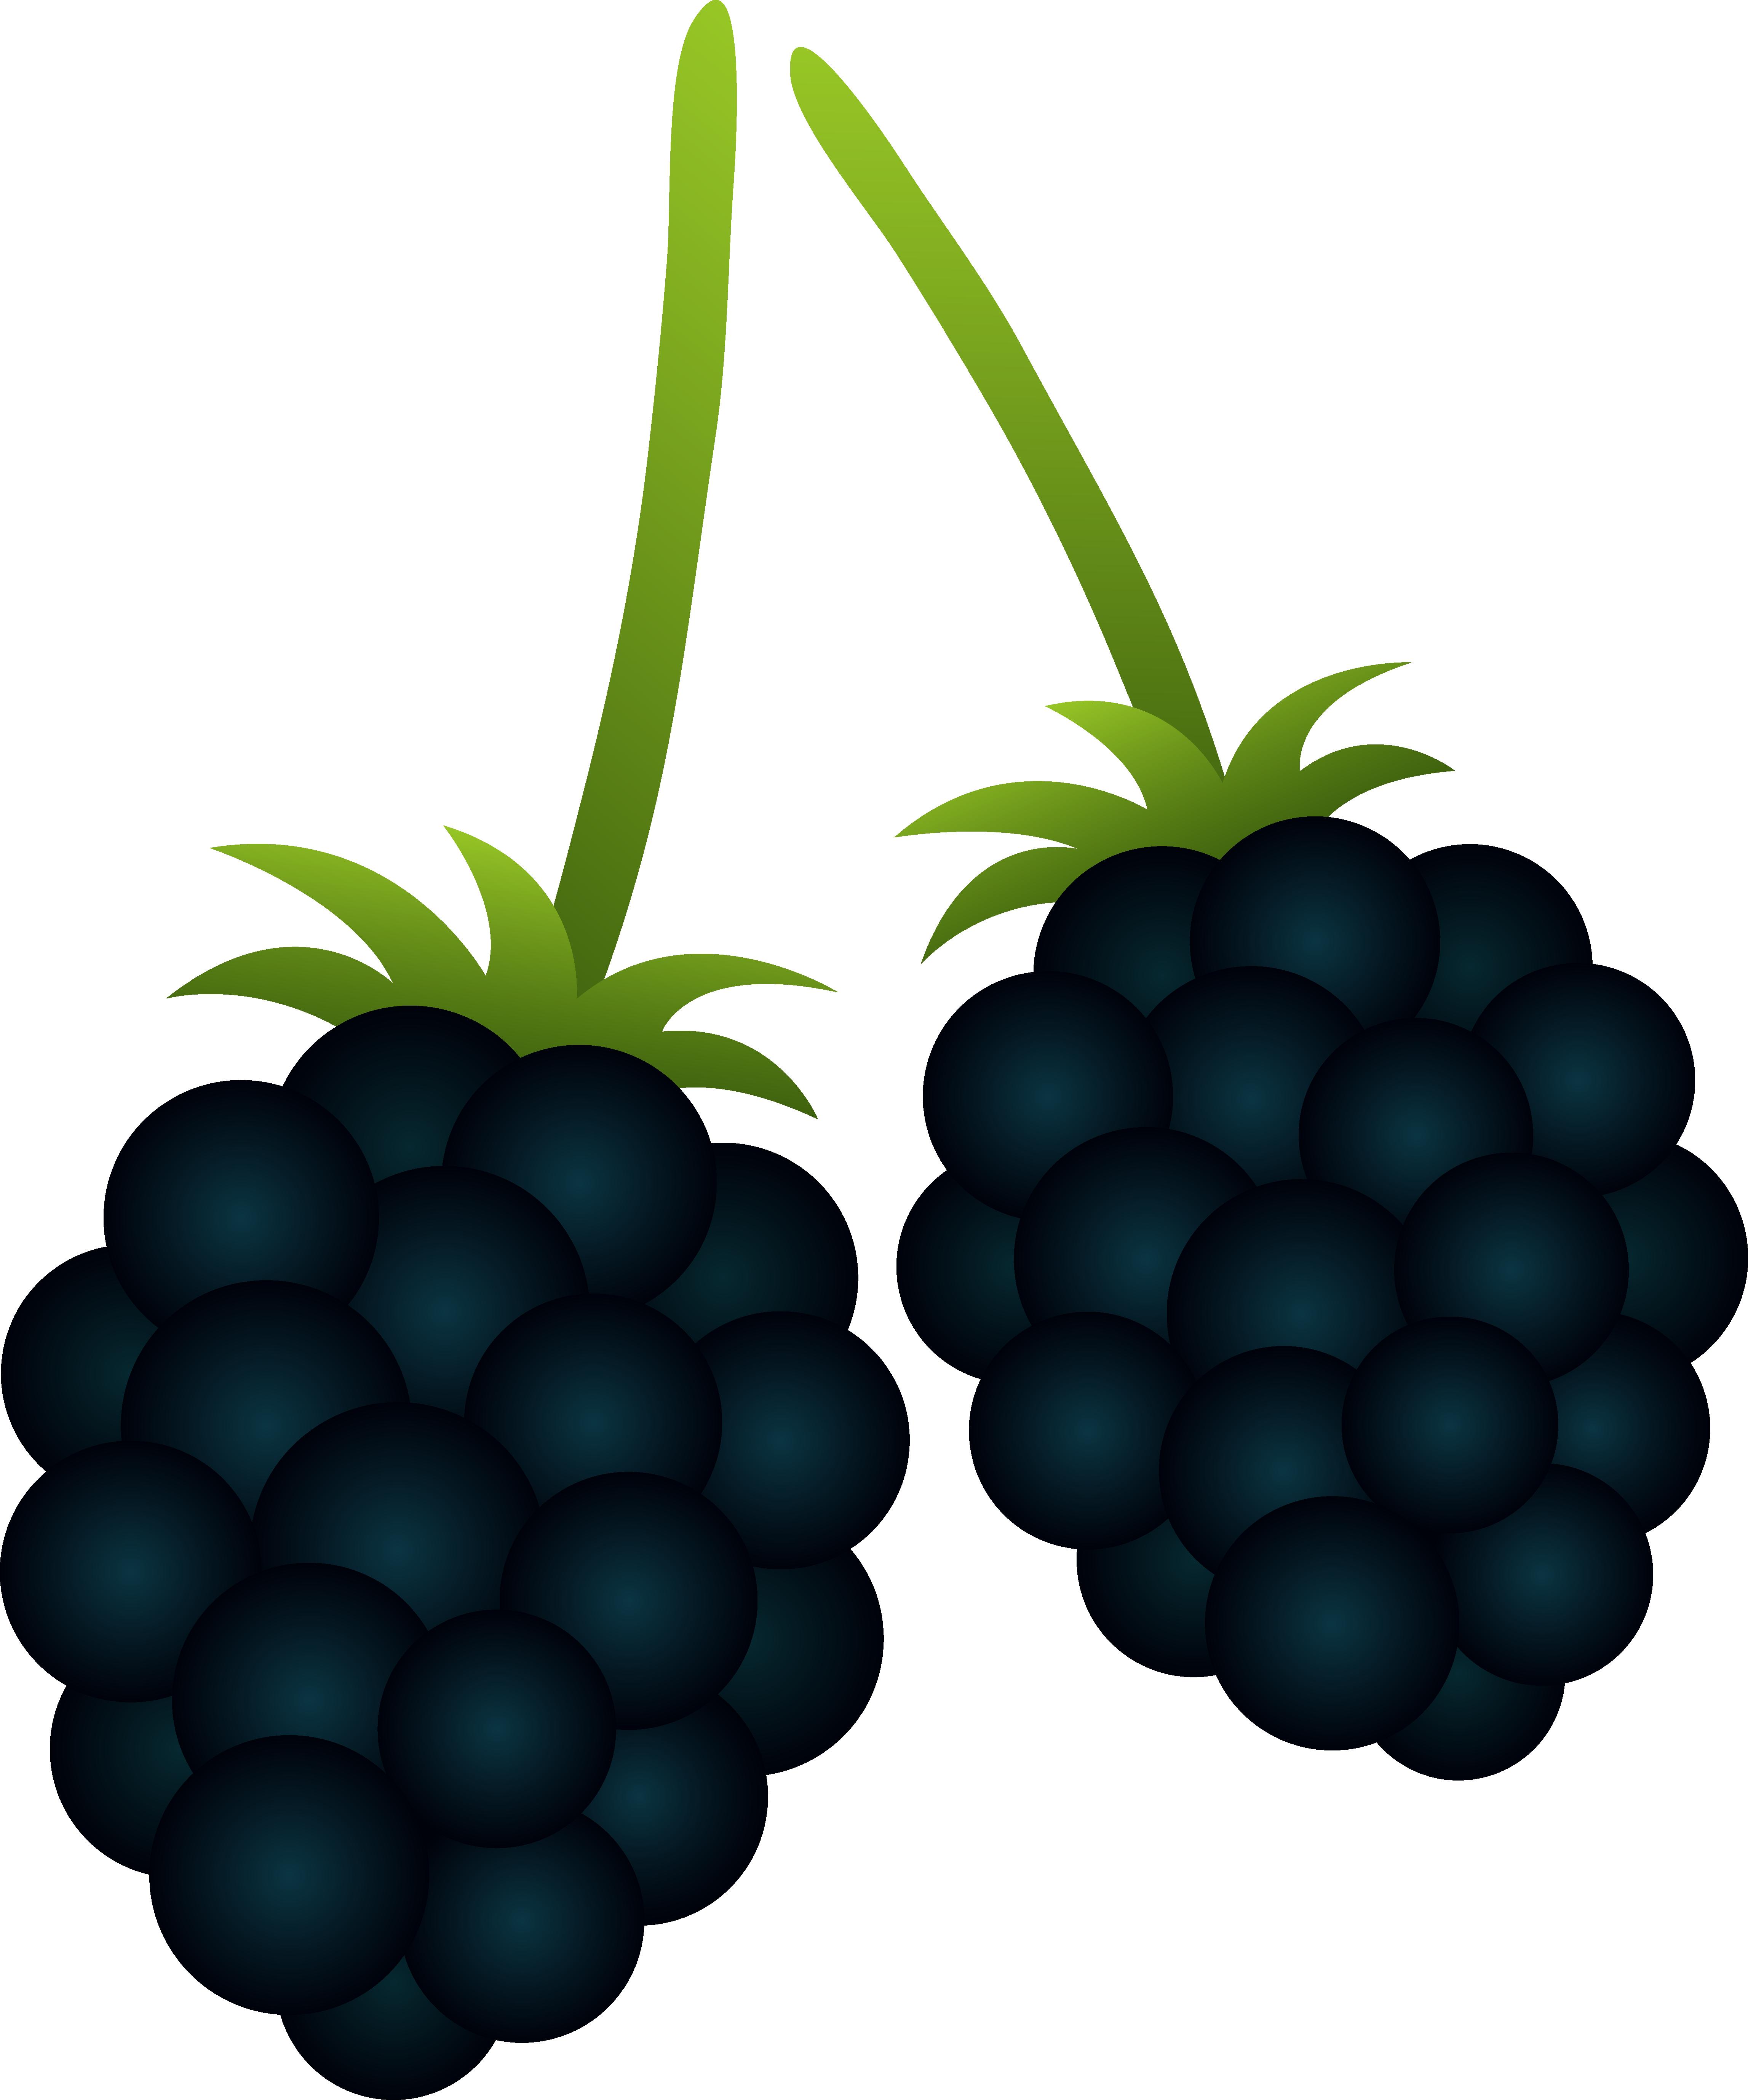 Blackberry clipart Clipart Blackberry cliparts Blackberry